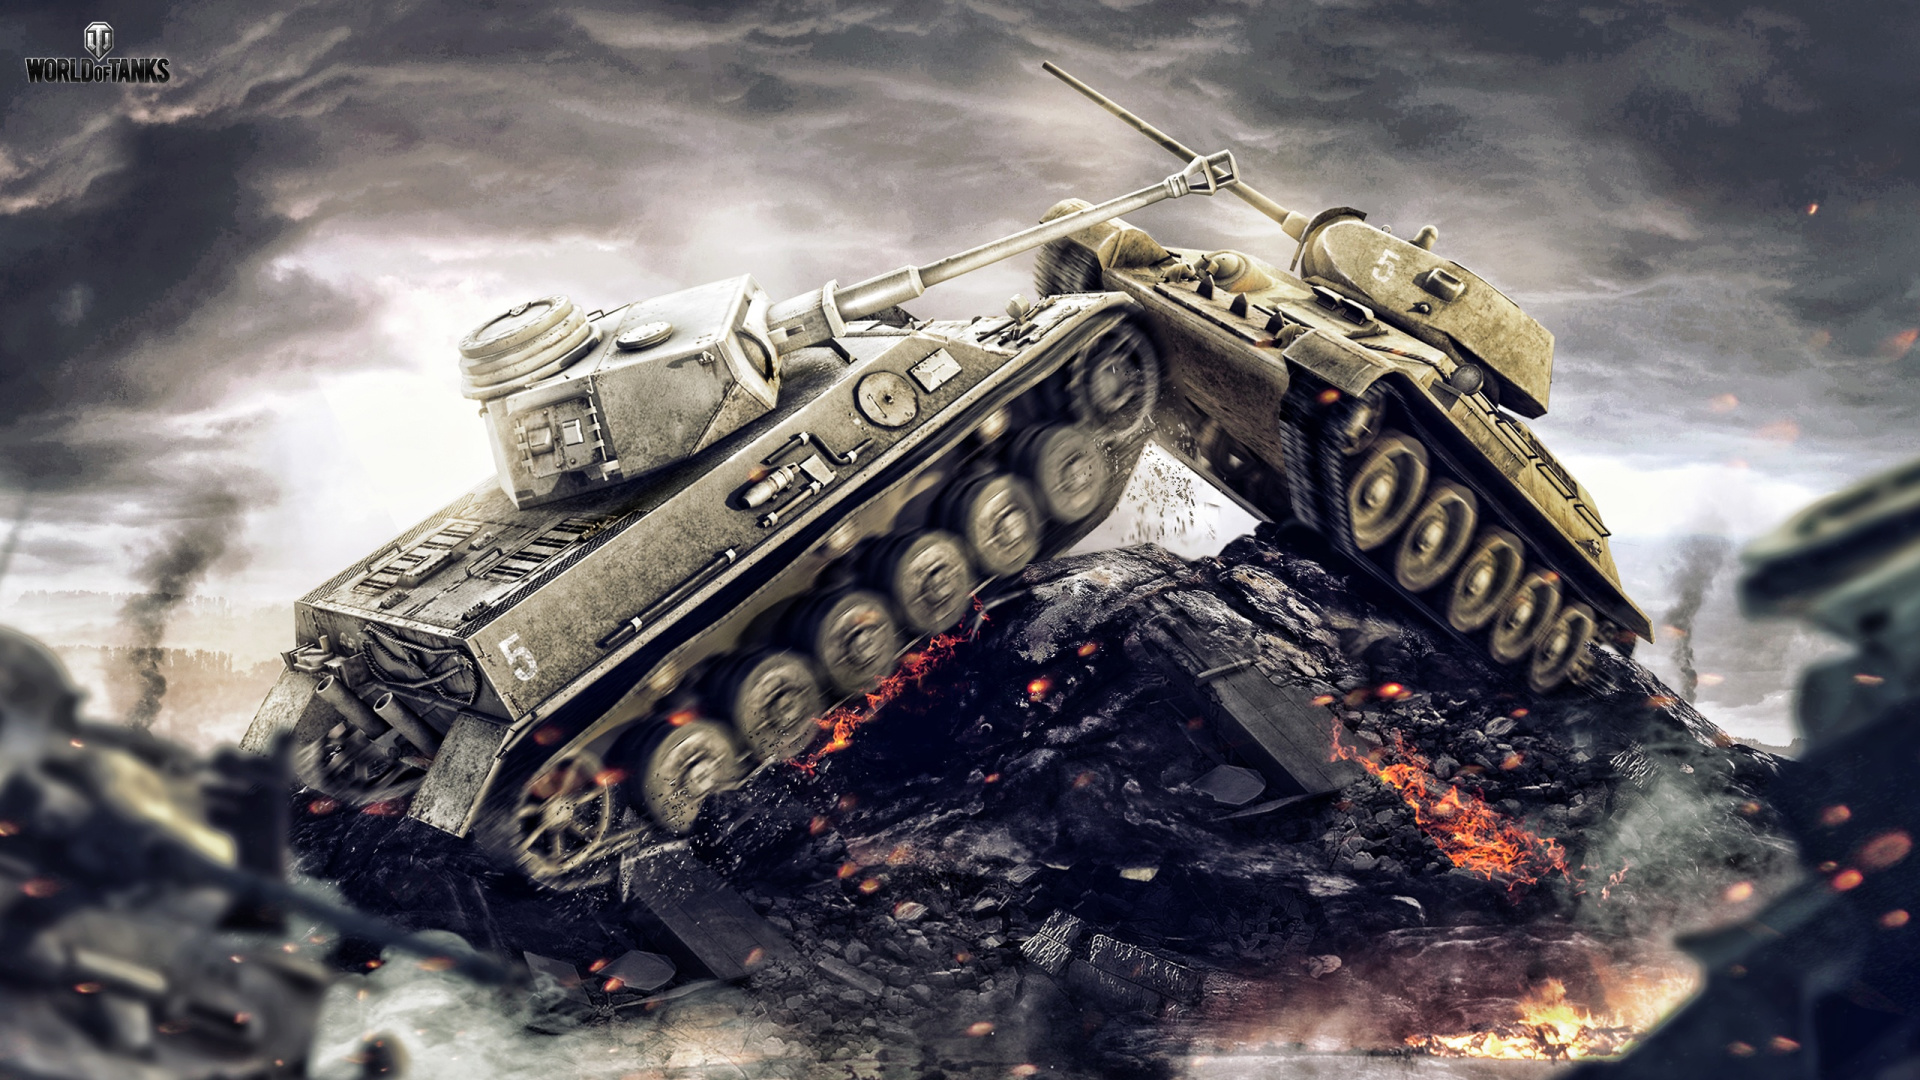 Красивые картинки с танками, пушкин картинки для